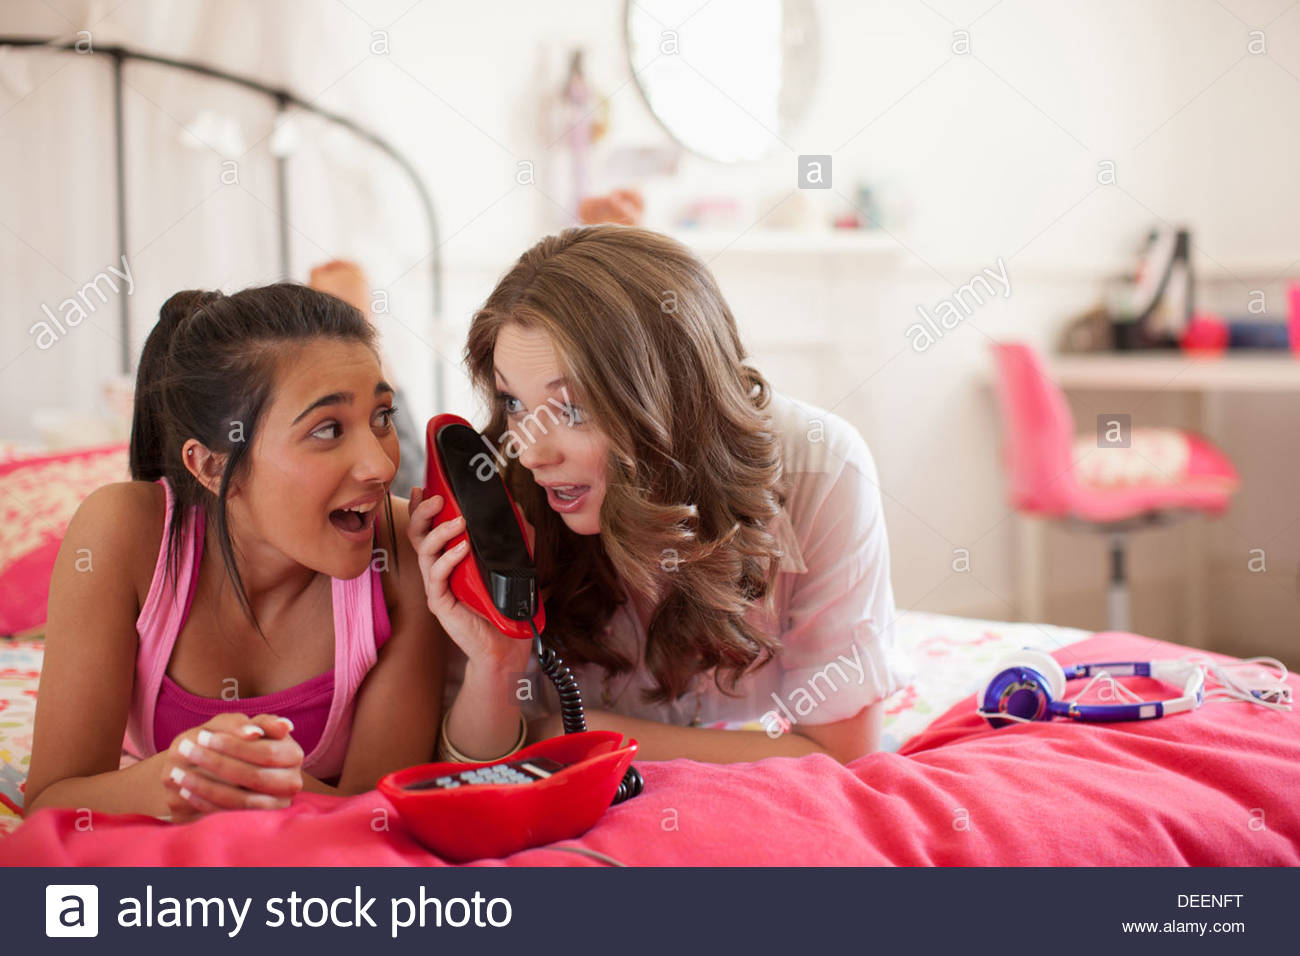 Teenage girls talking on telephone in bedroom - Stock Image